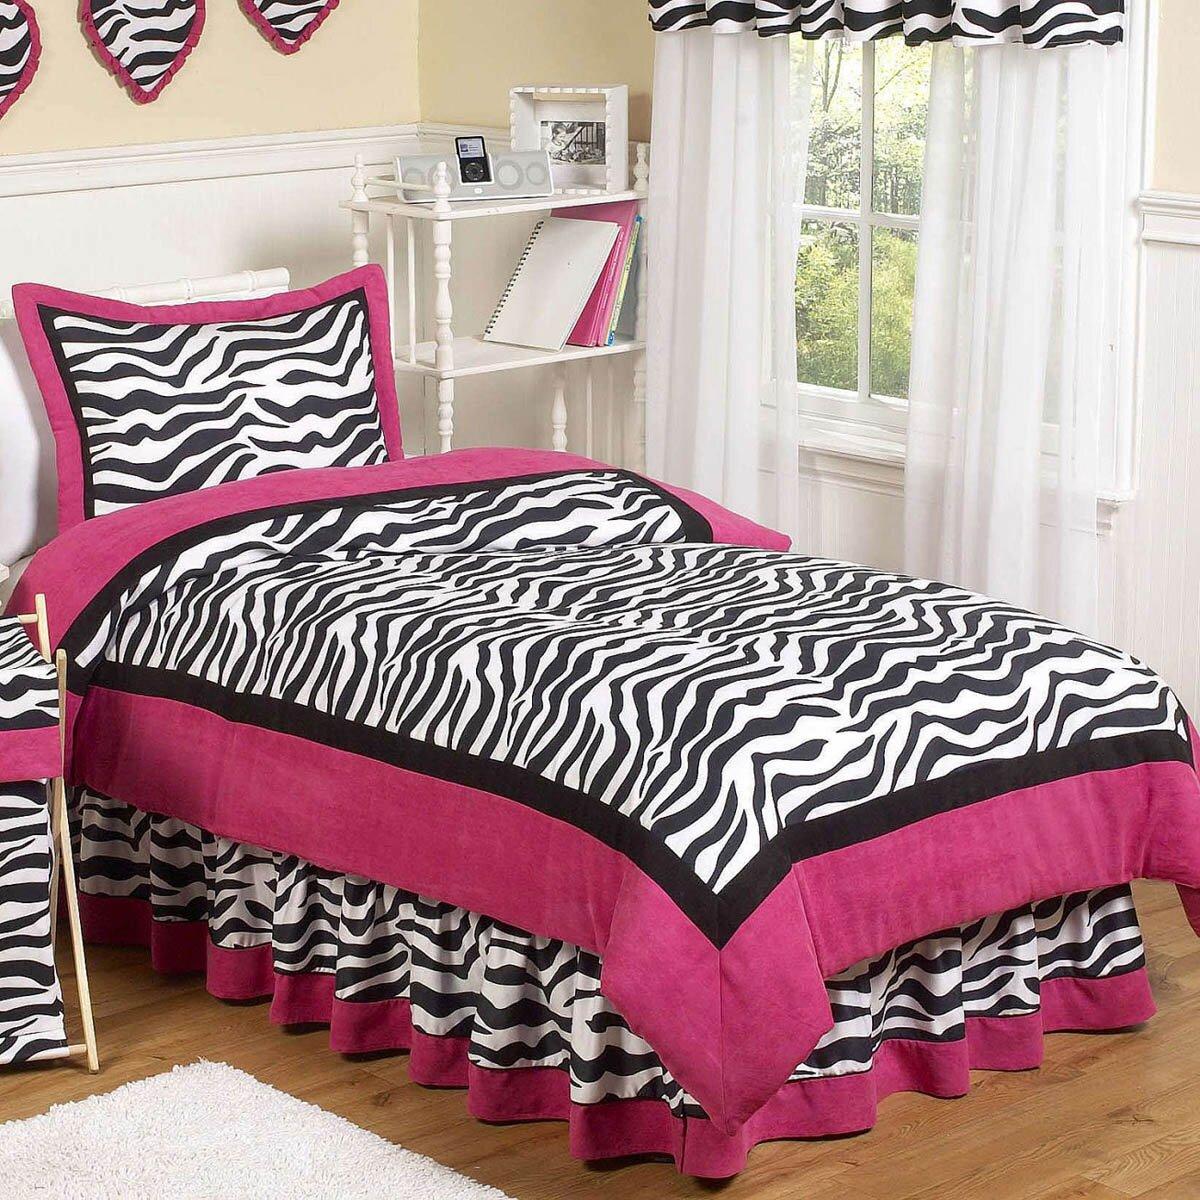 Zebra Print Decor 1